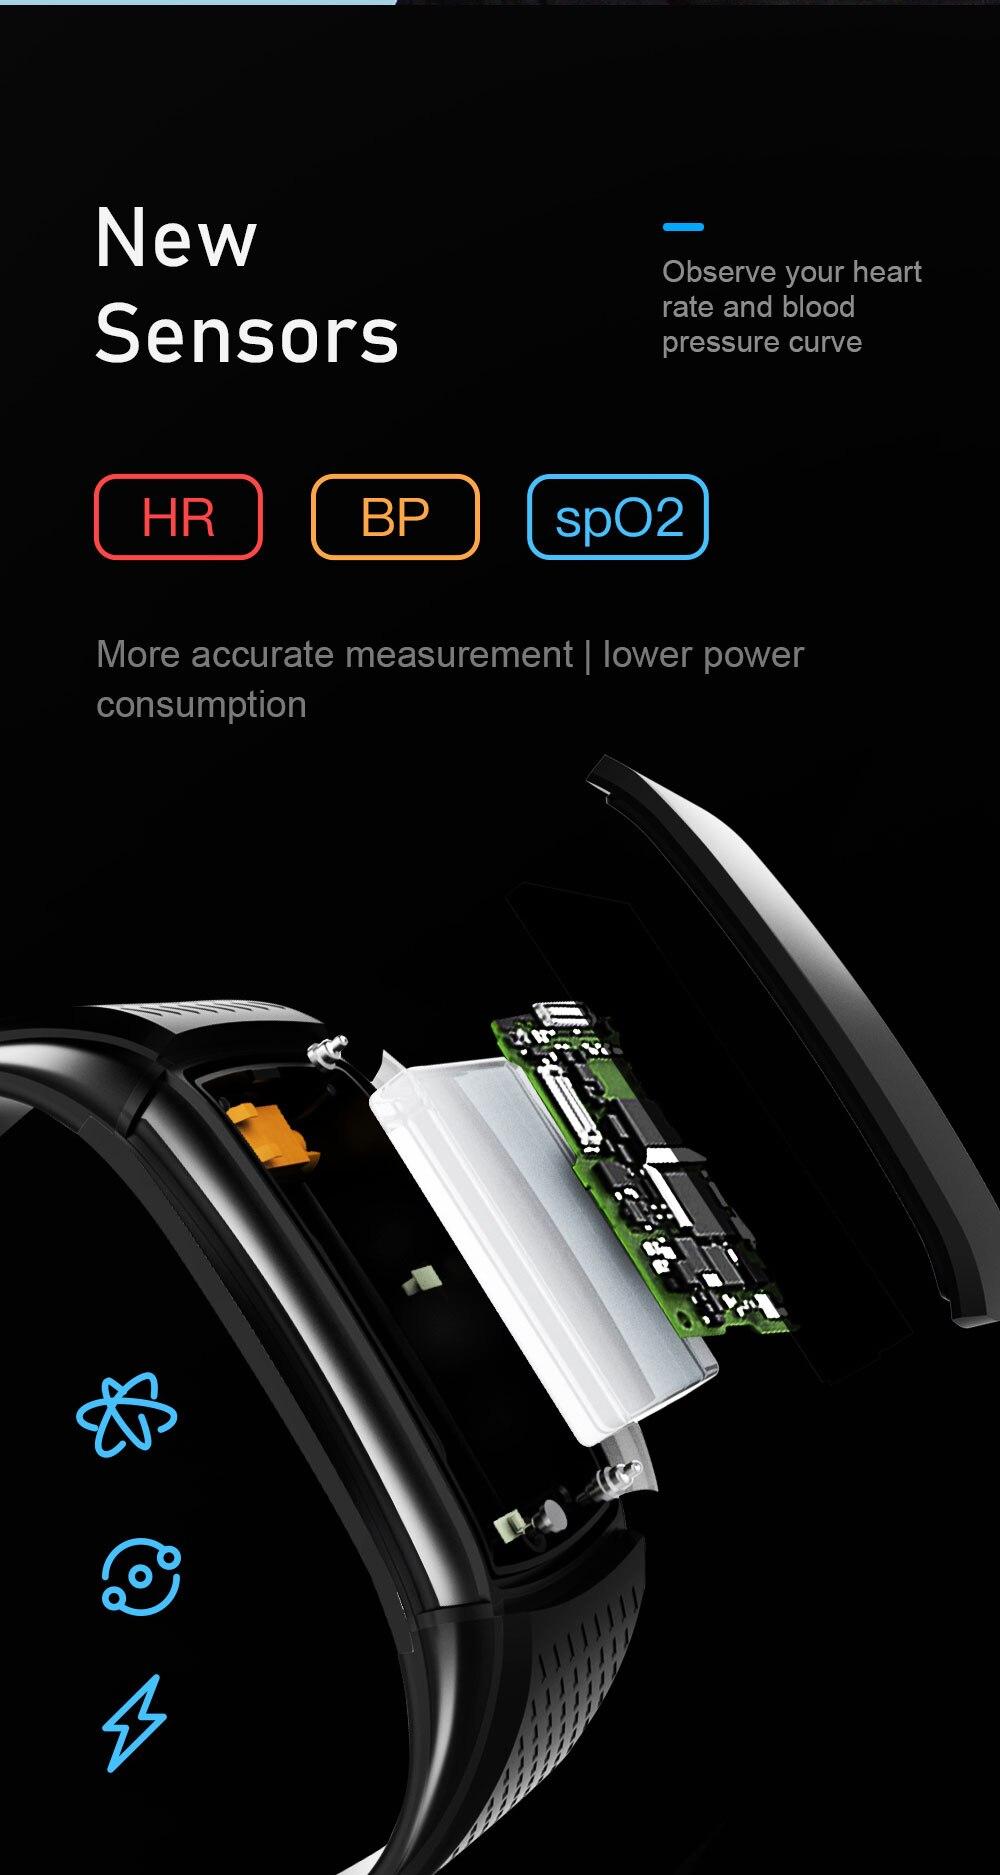 H818eb5b3ccff4cca881056b82f9b0a82L Smart Fitness Bracelet Blood Pressure Measurement Fitness Tracker Waterproof Smart Band Watch Heart Rate Tracker For Women Men